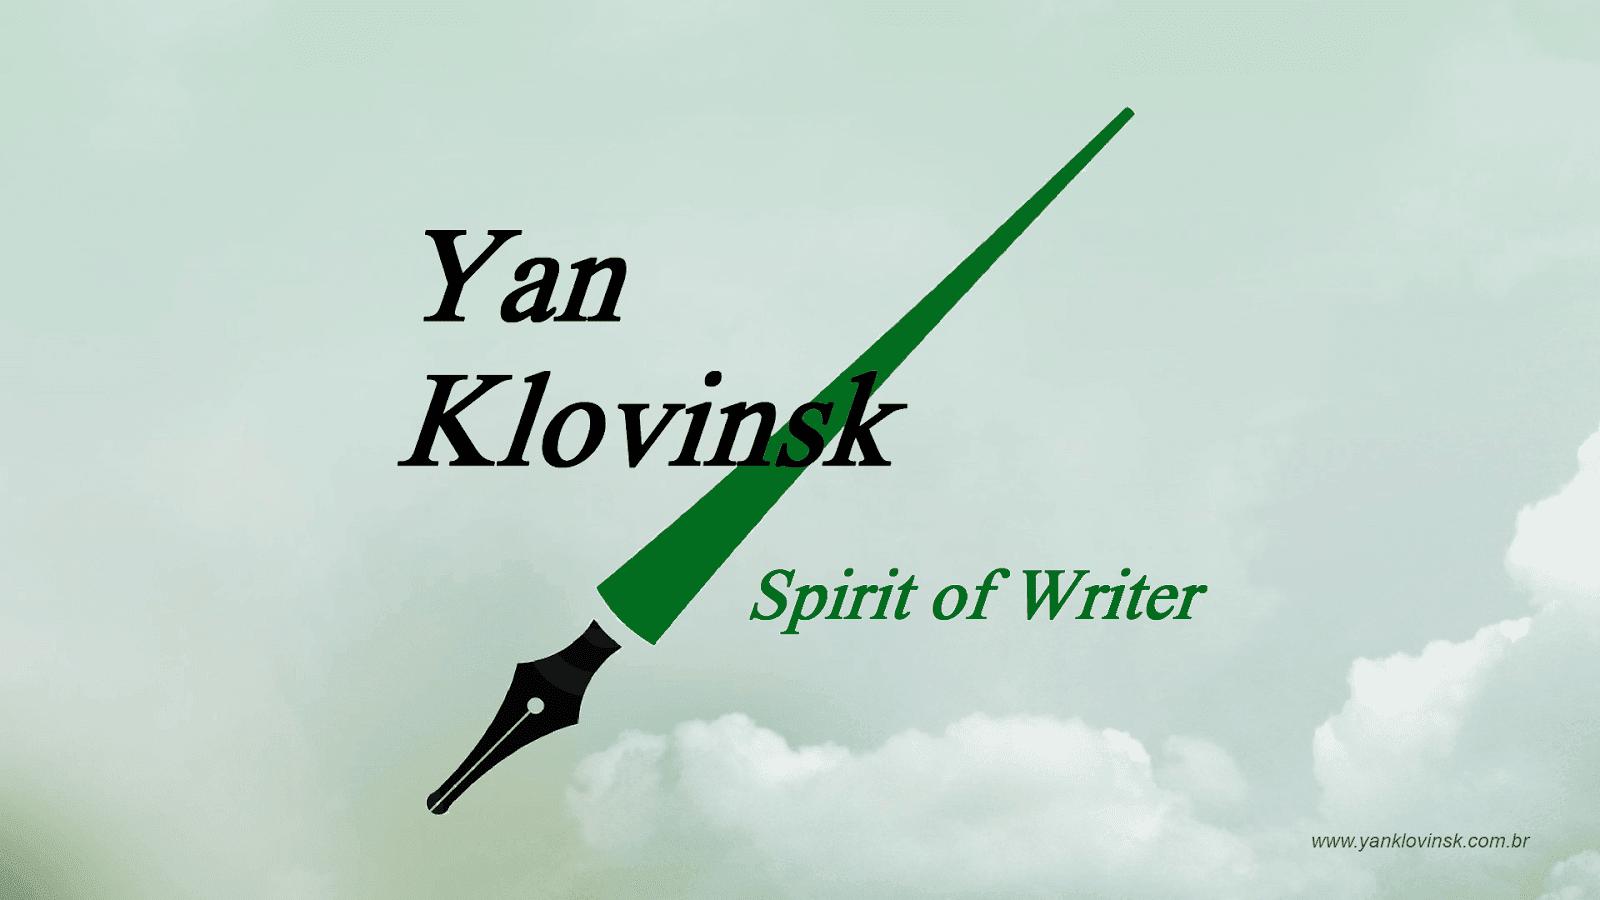 Logo Yan Klovinsk Escritor